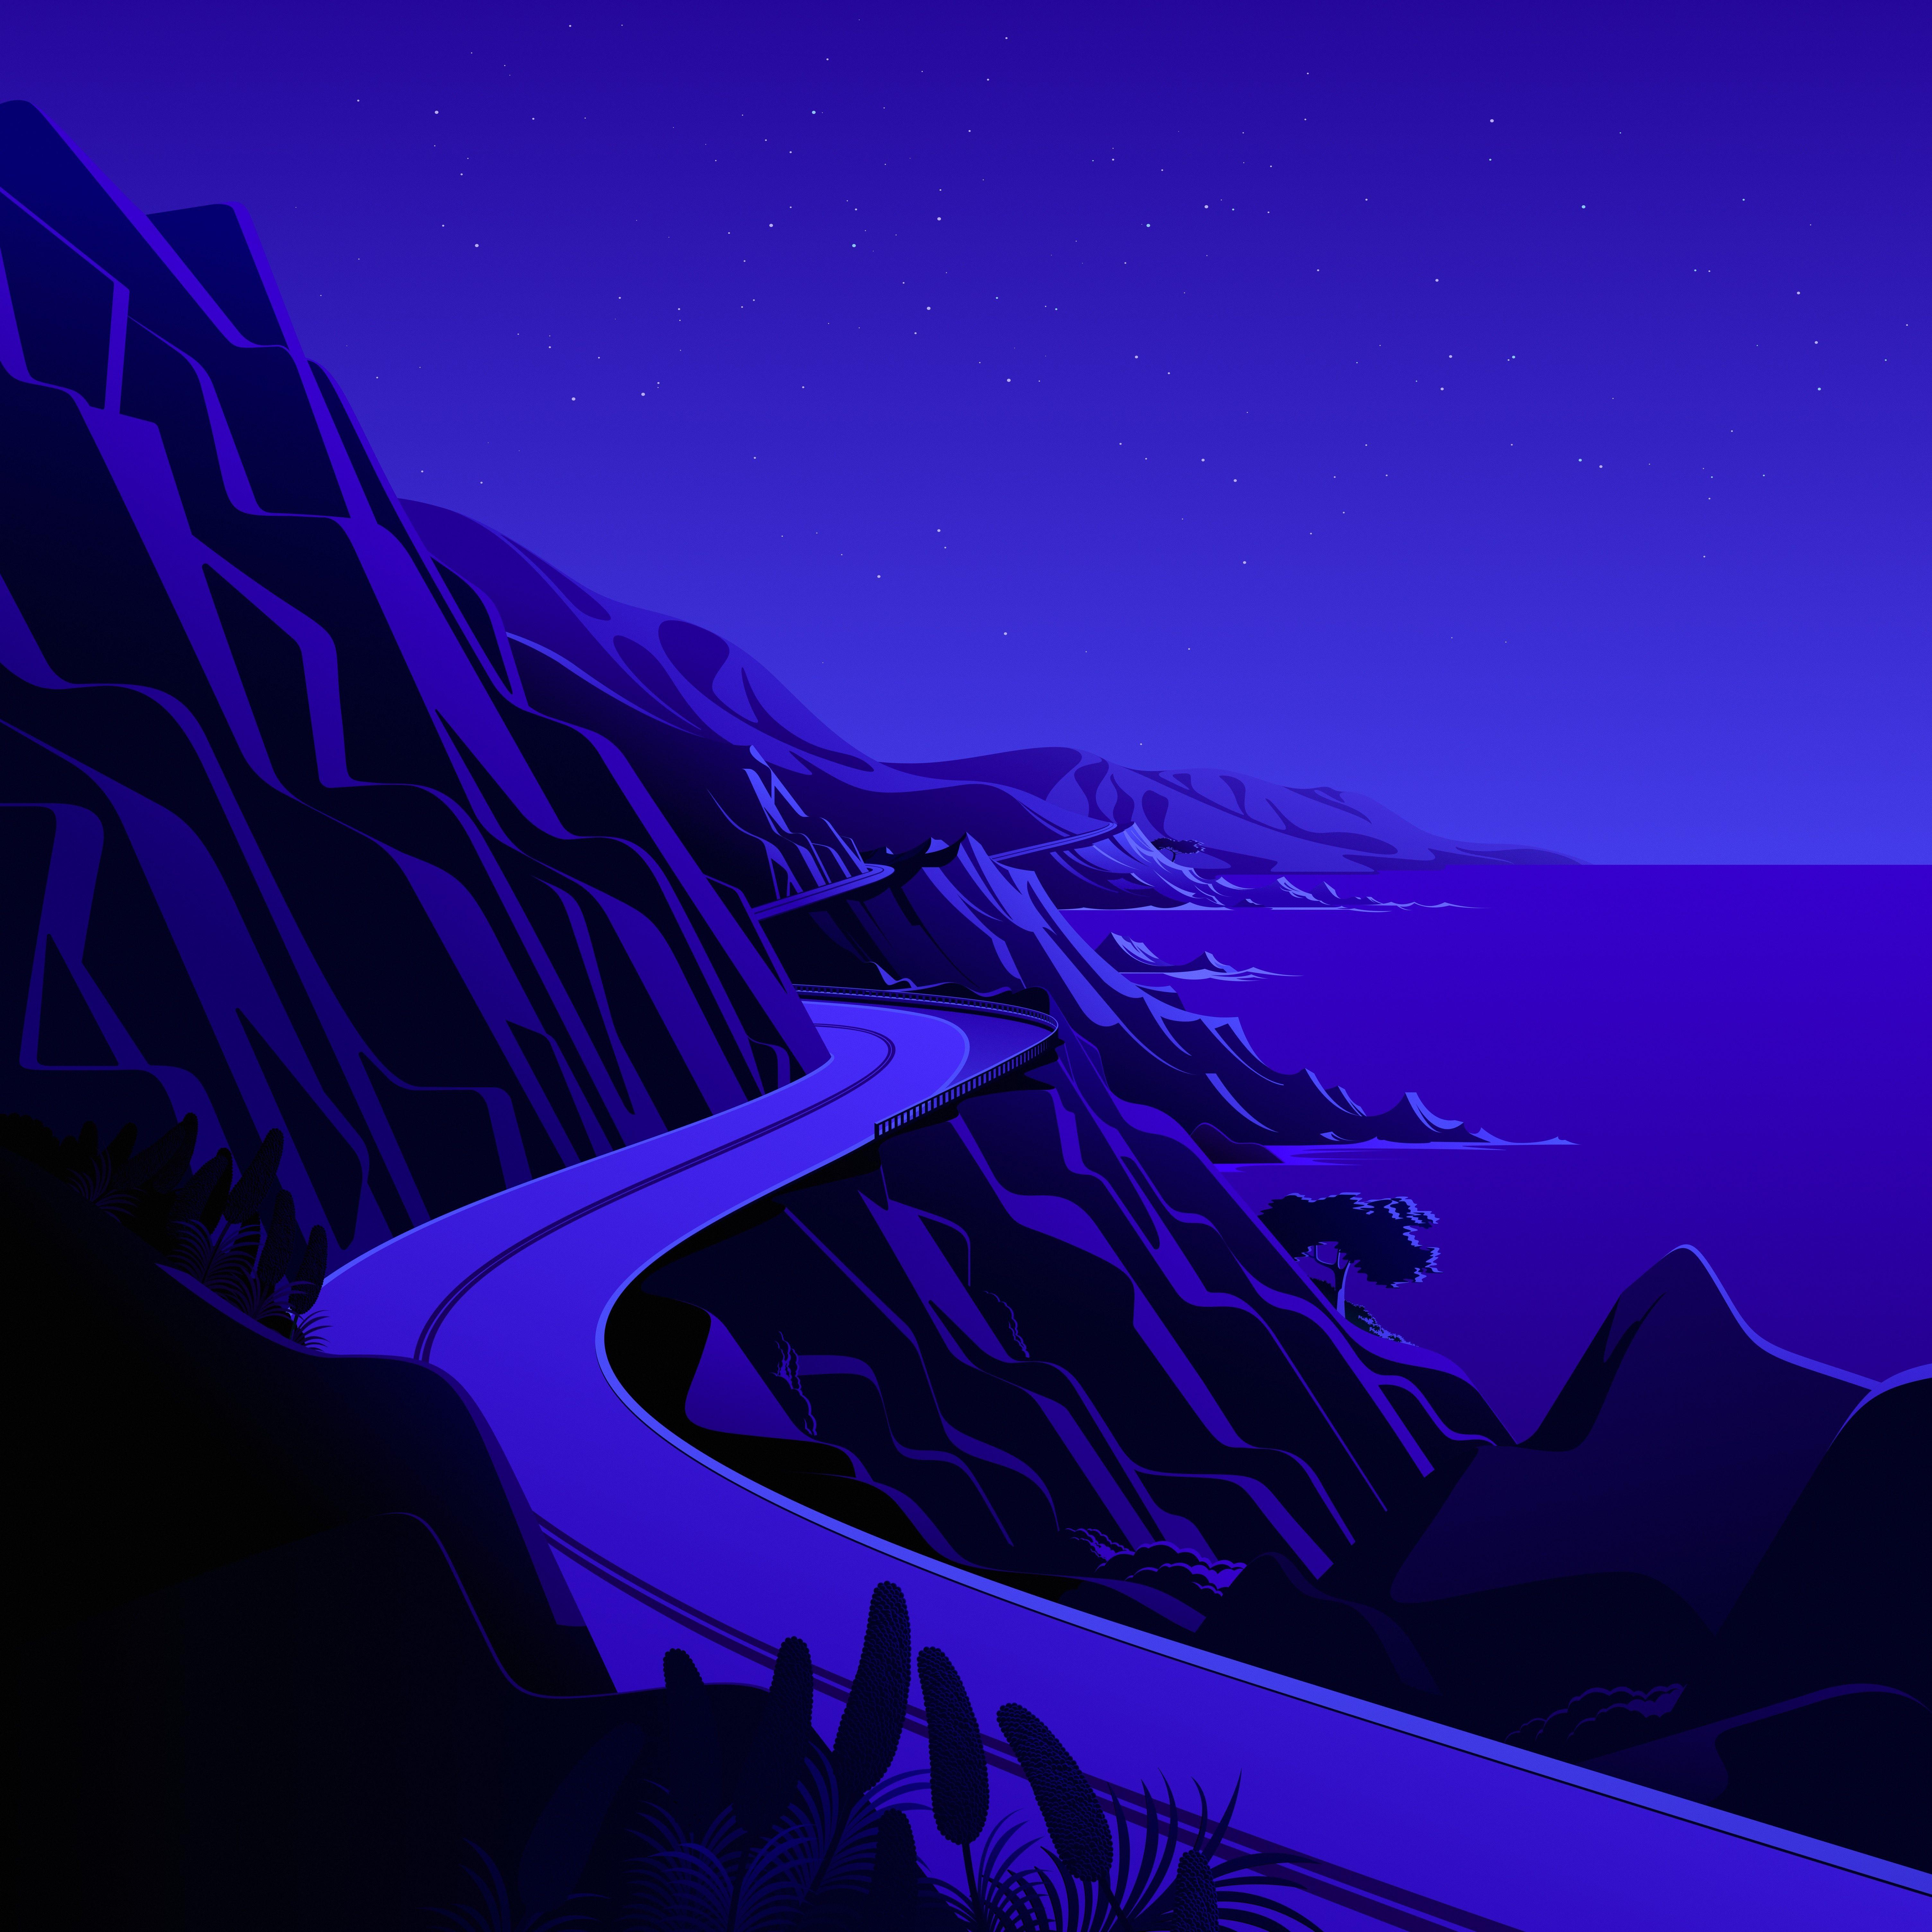 macOS Big Sur The Cliffs 2 dragged